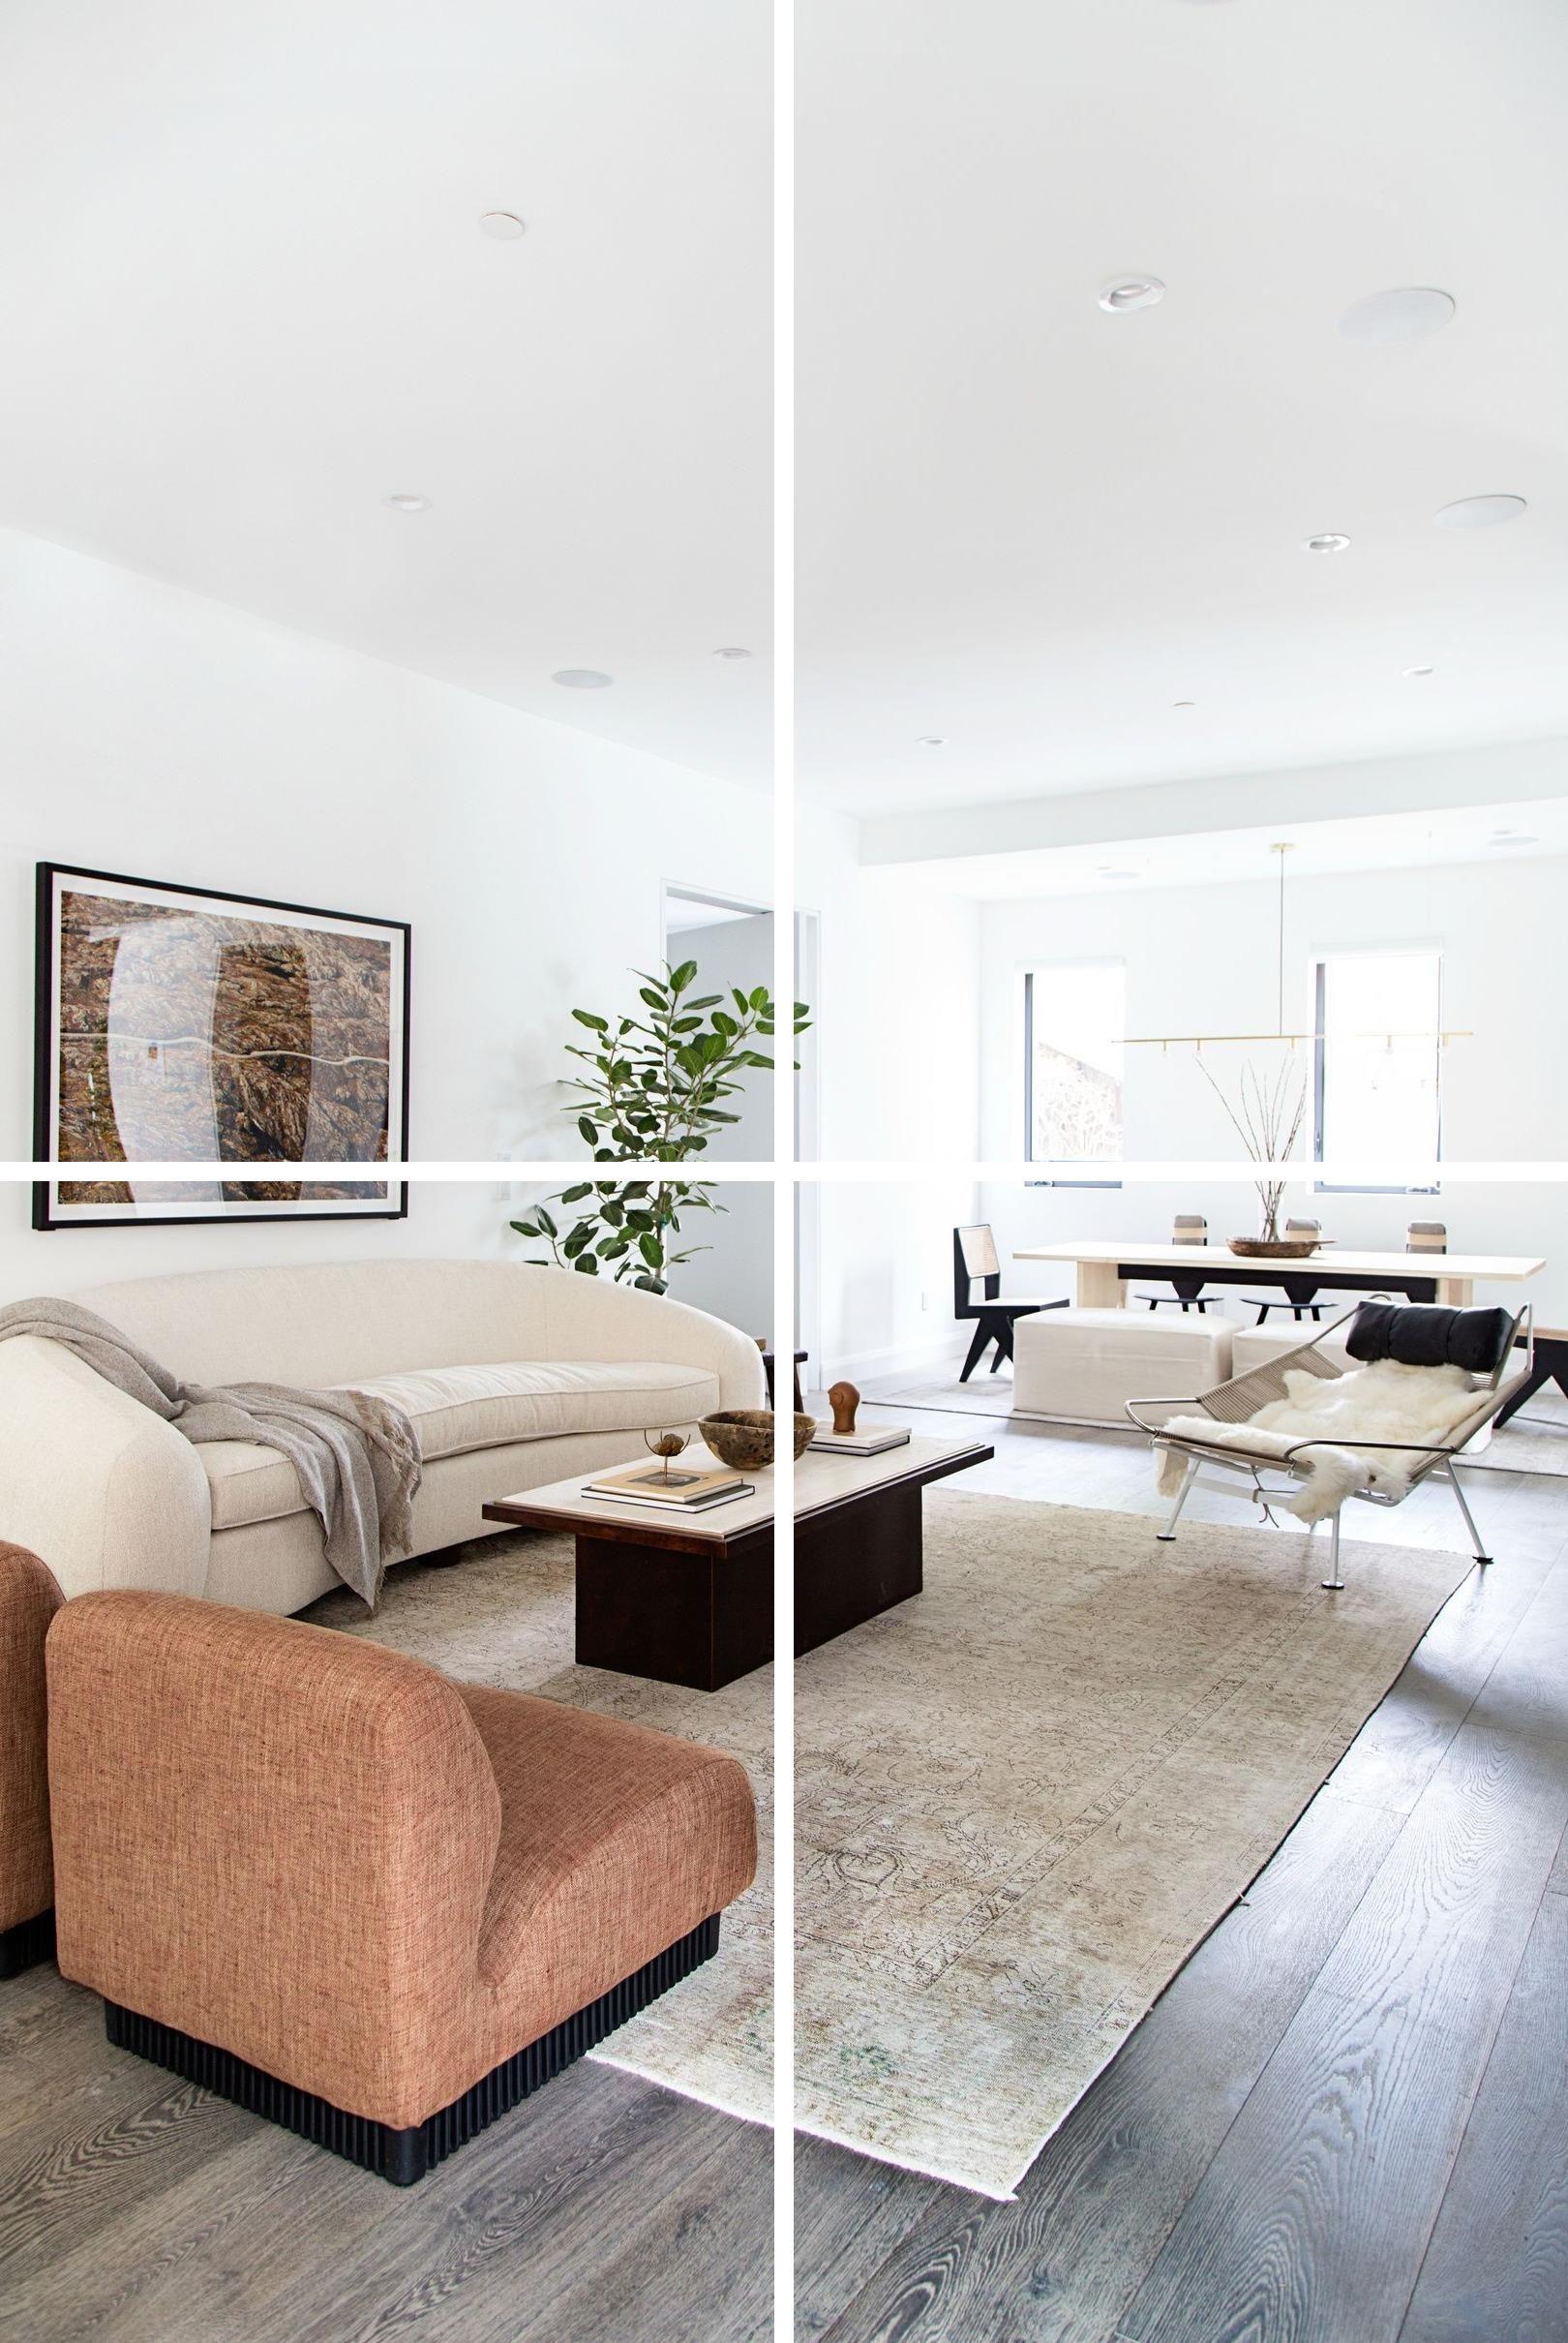 Sitting Room Decor Ideas Ideas To Decorate Your Living Room New Design Interior Living Room Contemporary Home Decor Home Decor Styles Home Decor Living room decor styles